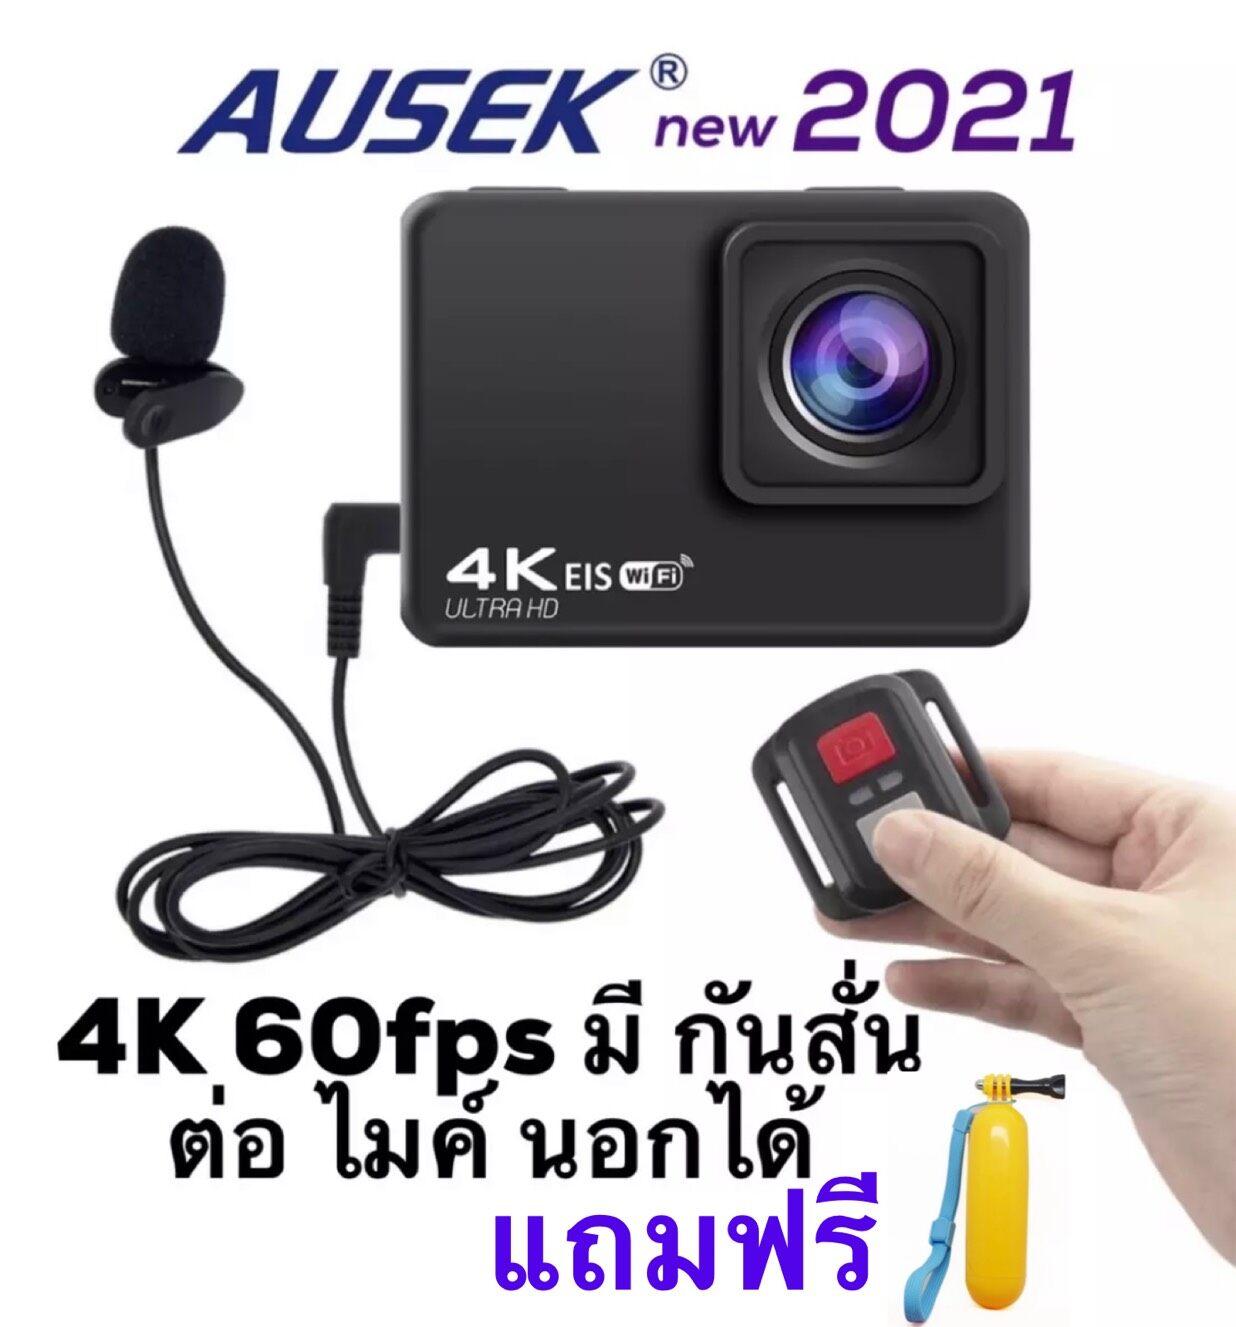 Ausek รุ่นat-Q37c 4k60fpseis Allwinnerv316 Actioncamera มีระบบกันสั่น มีช่องต่อสายไมค์ได้ รุ่นอัพเกรดพิเศษจากทางร้าน มีรีโมท+อุปกรณ์ครบชุด เฟิร์มแวร์ล่าสุด.